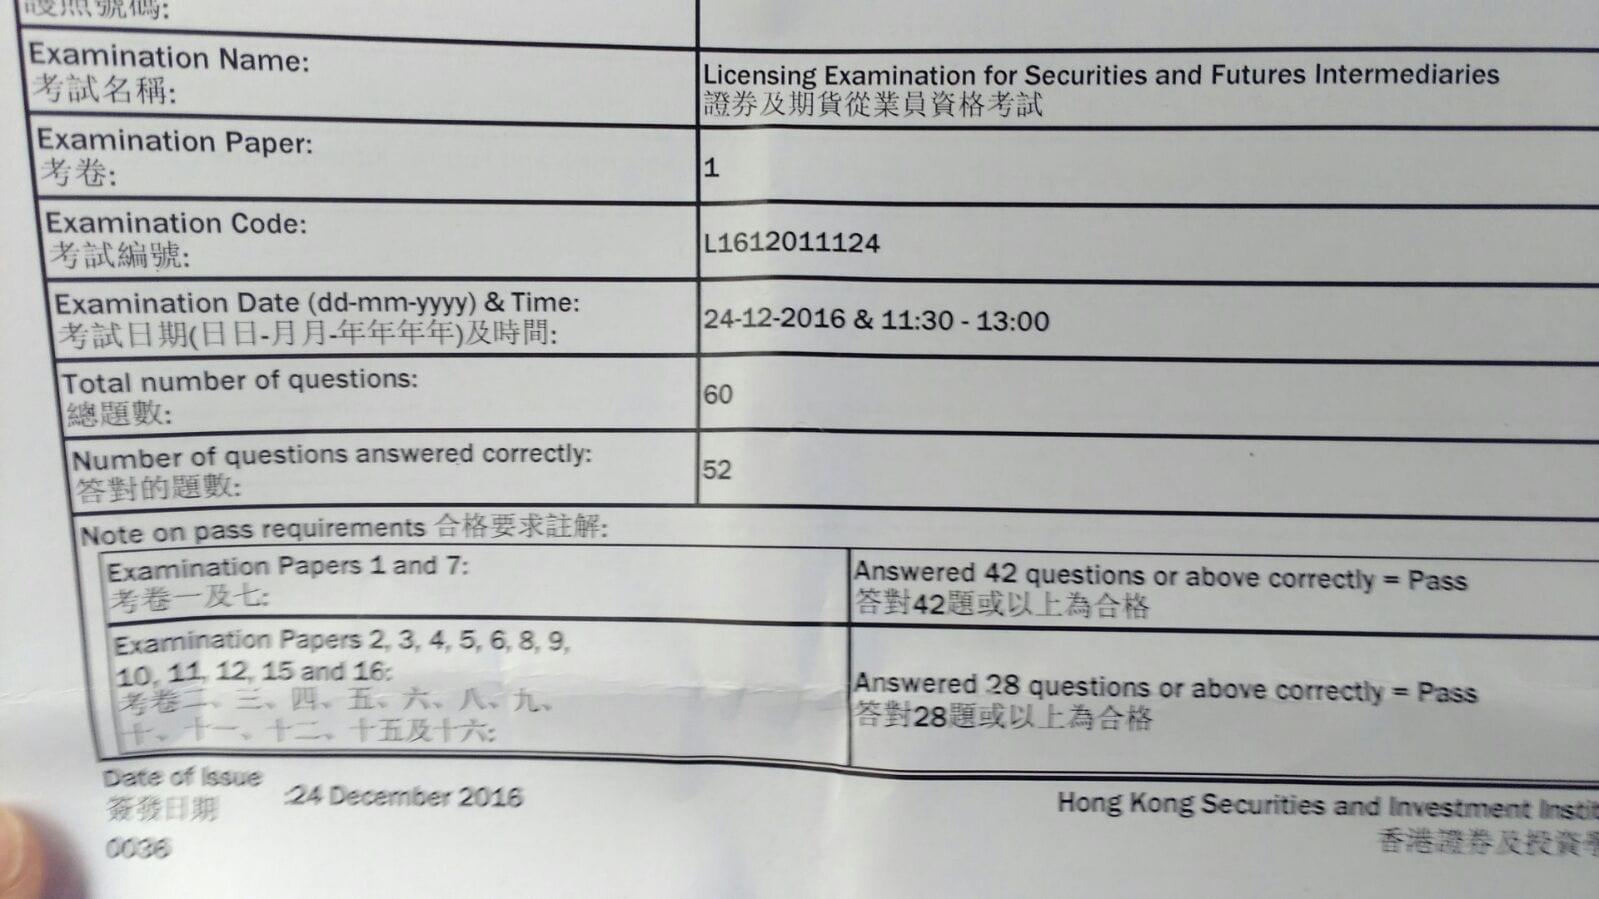 LSP 24/12/2016 LE Paper 1 證券期貨從業員資格考試卷一 Pass